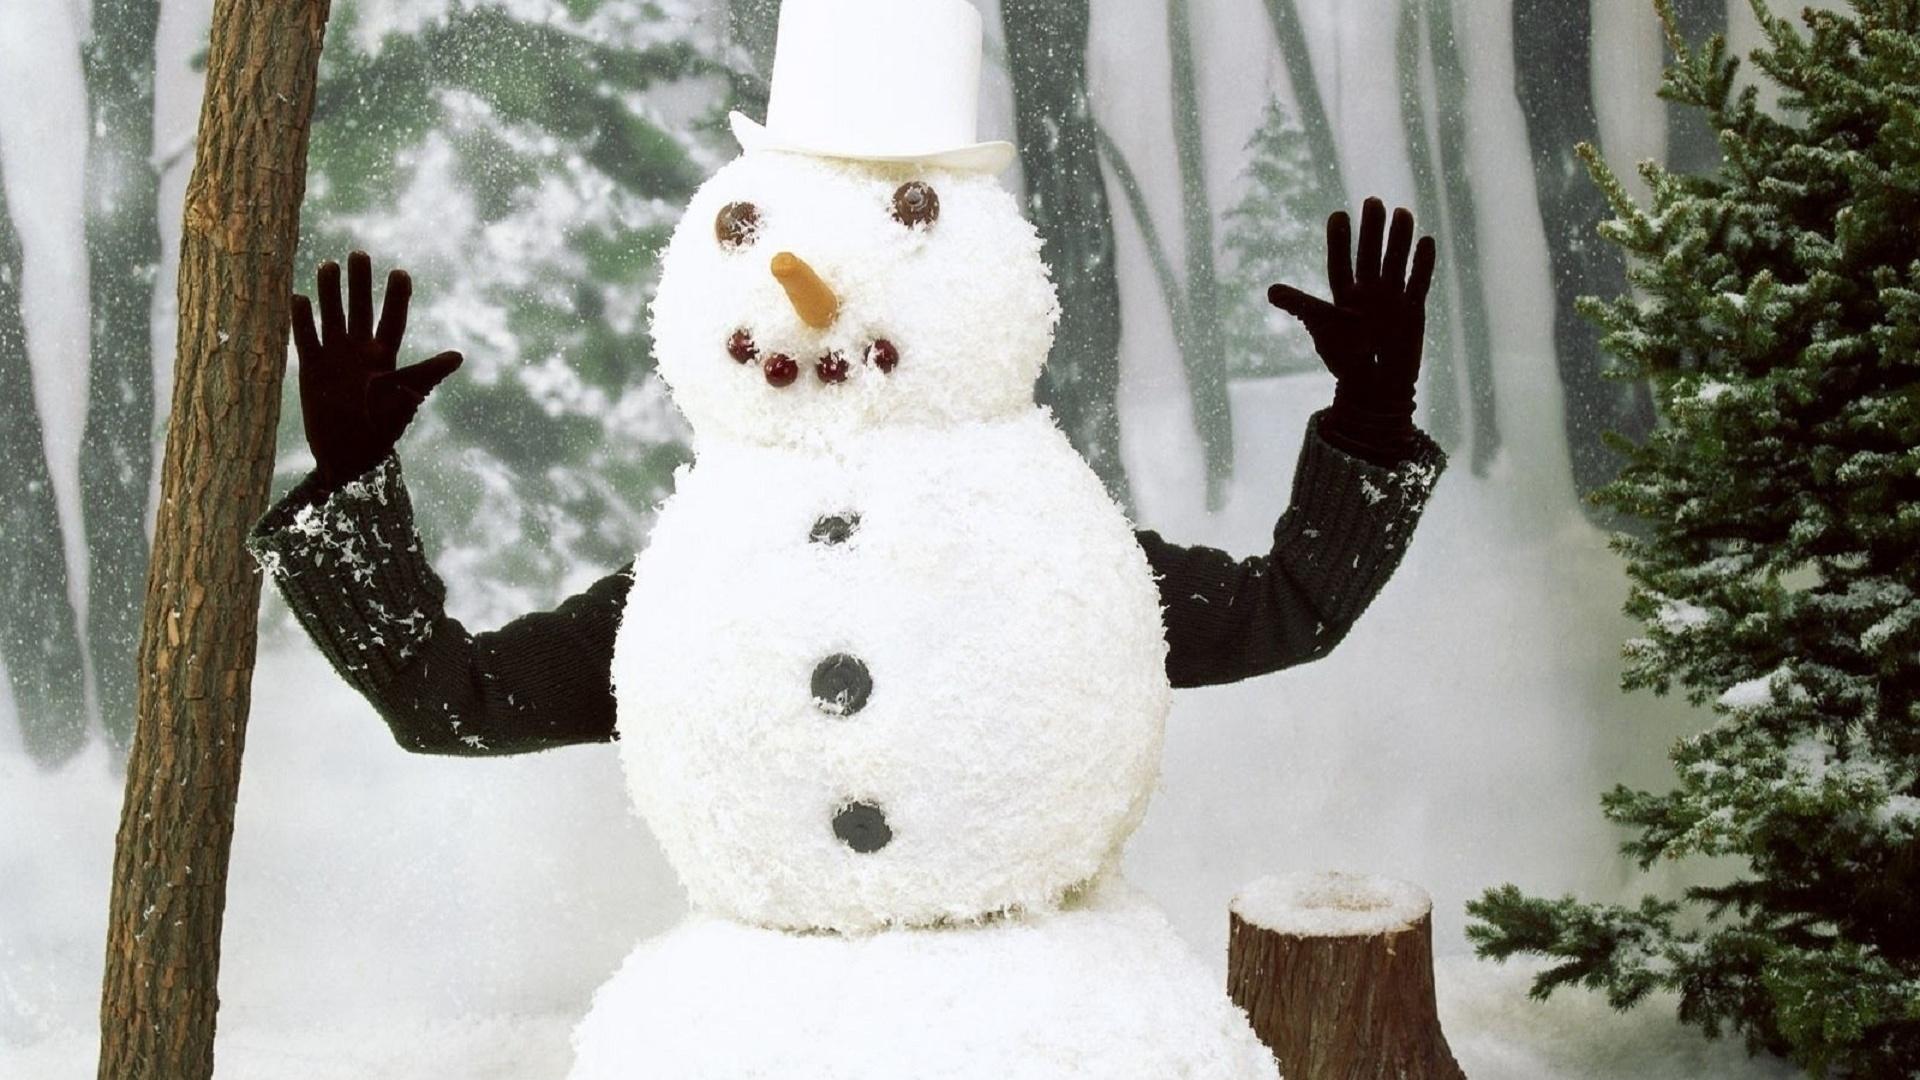 Картинки крутые снеговики, открытки